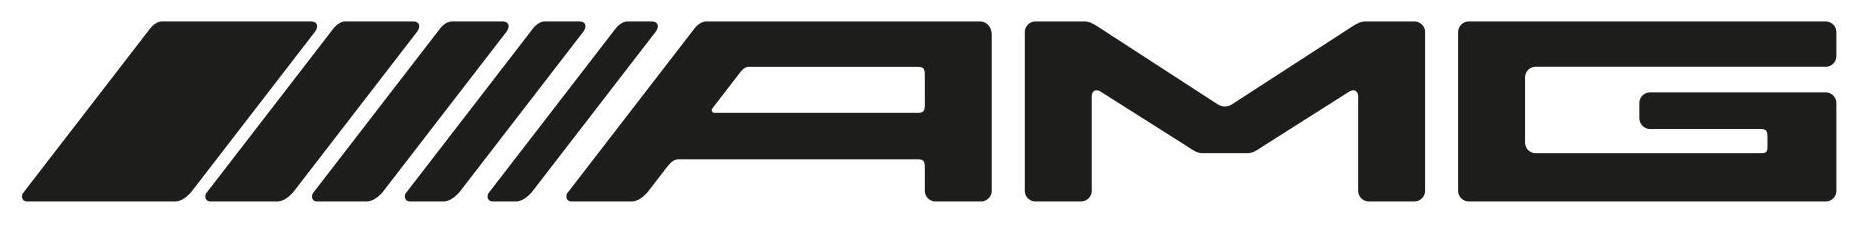 amg logo vector